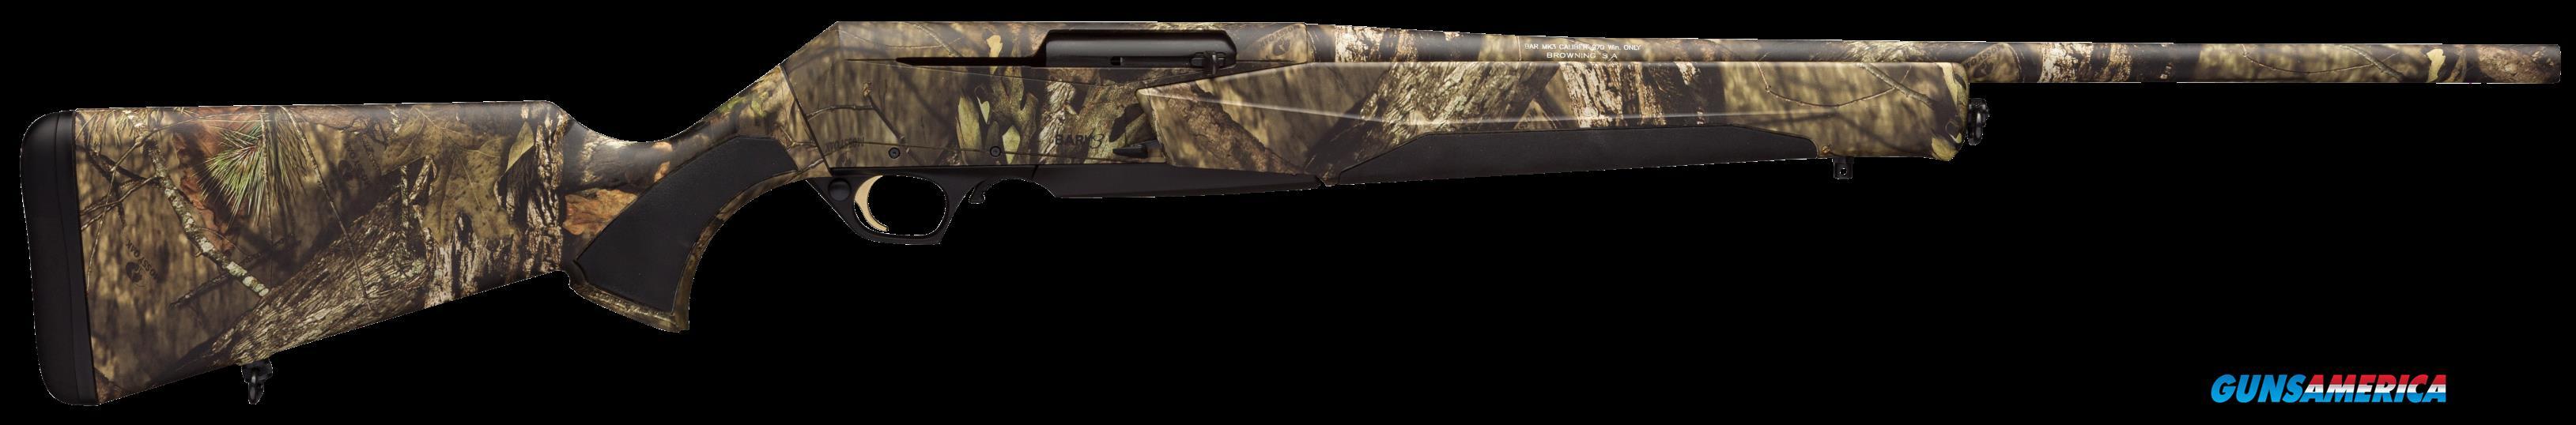 Browning Bar, Brn 031-049246 Bar Mk3 300wsm    Mobuc  Guns > Pistols > 1911 Pistol Copies (non-Colt)